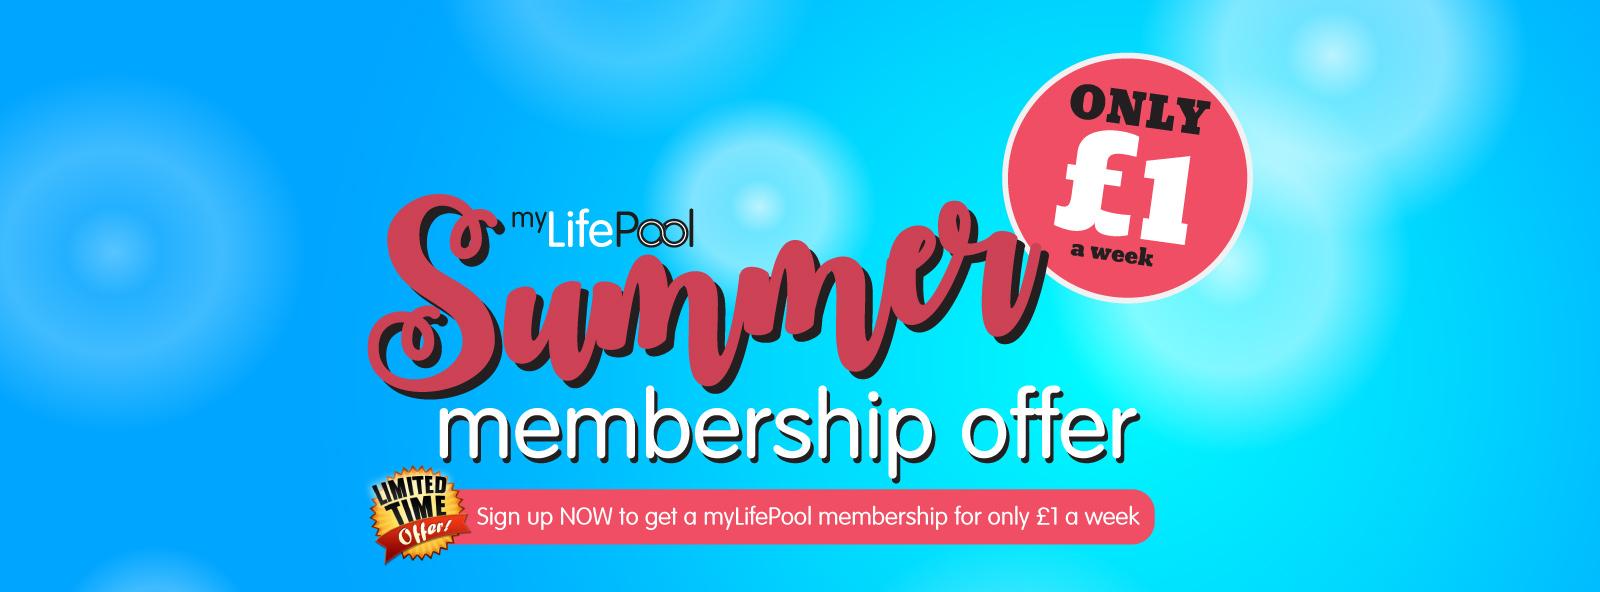 myLifePool Summer Membership Offer